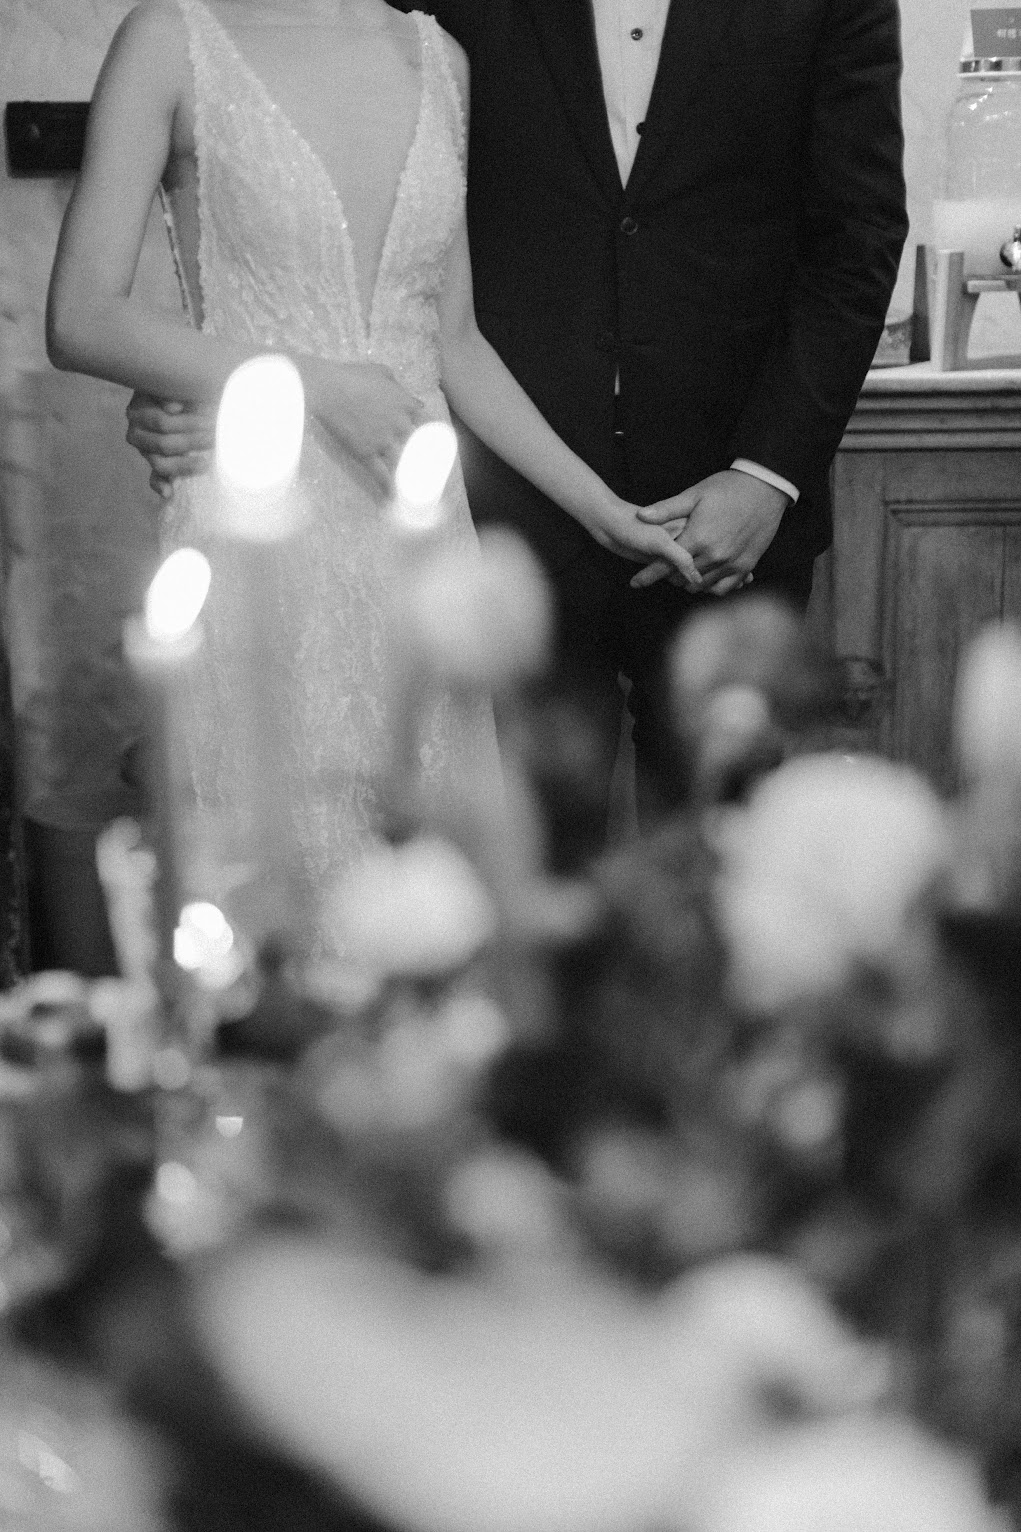 undefinedJifs 婚禮,Amazing Grace攝影,美式婚禮派對,小型婚禮,Wedding Party